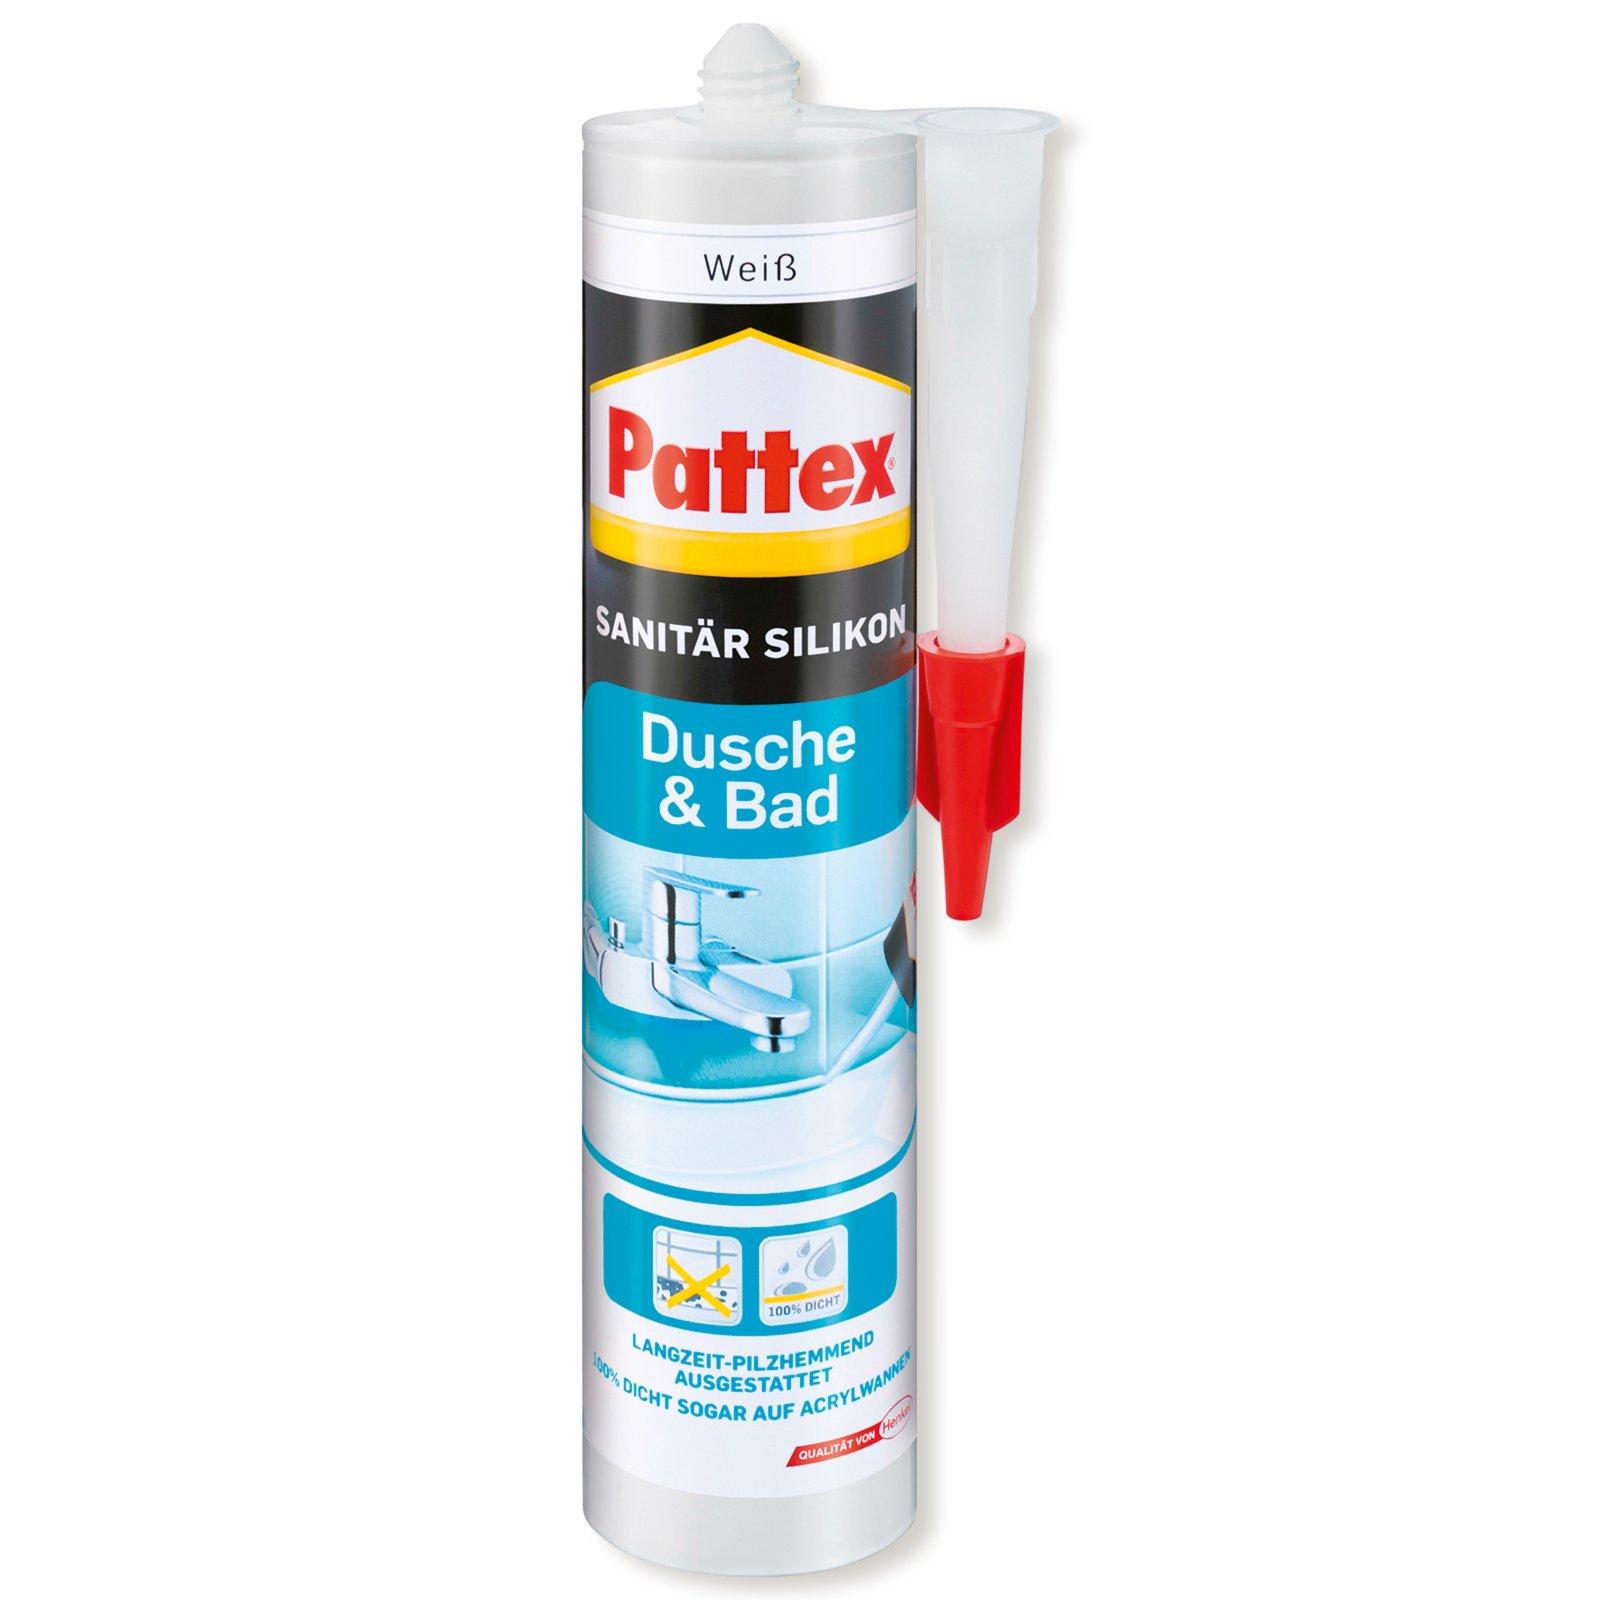 Pattex Sanitär Silikon - weiß - 310 g